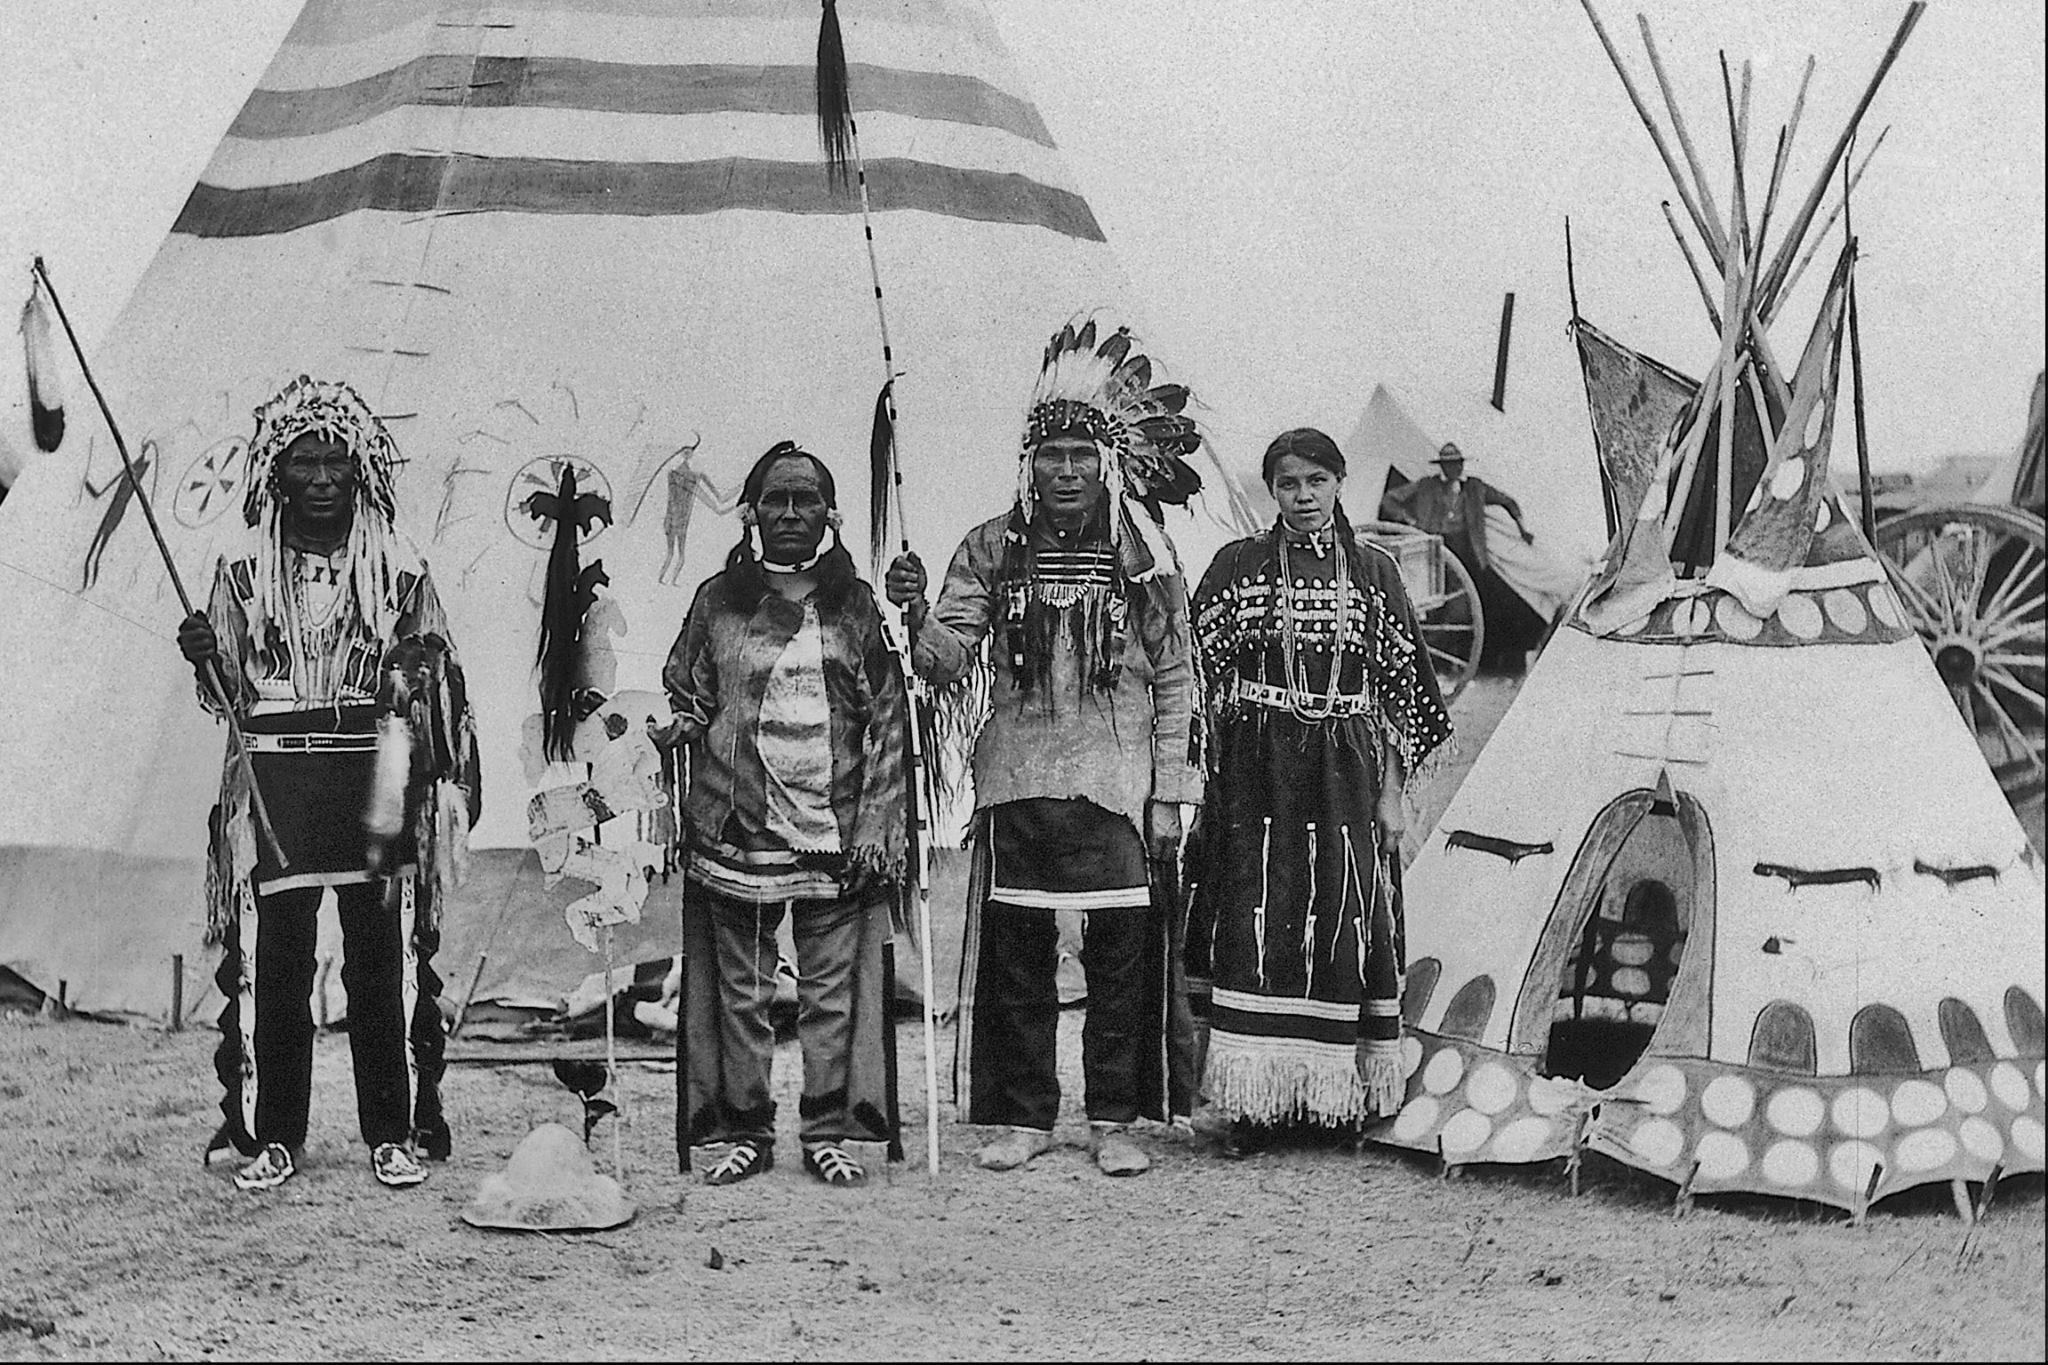 Blackfoot Group 87